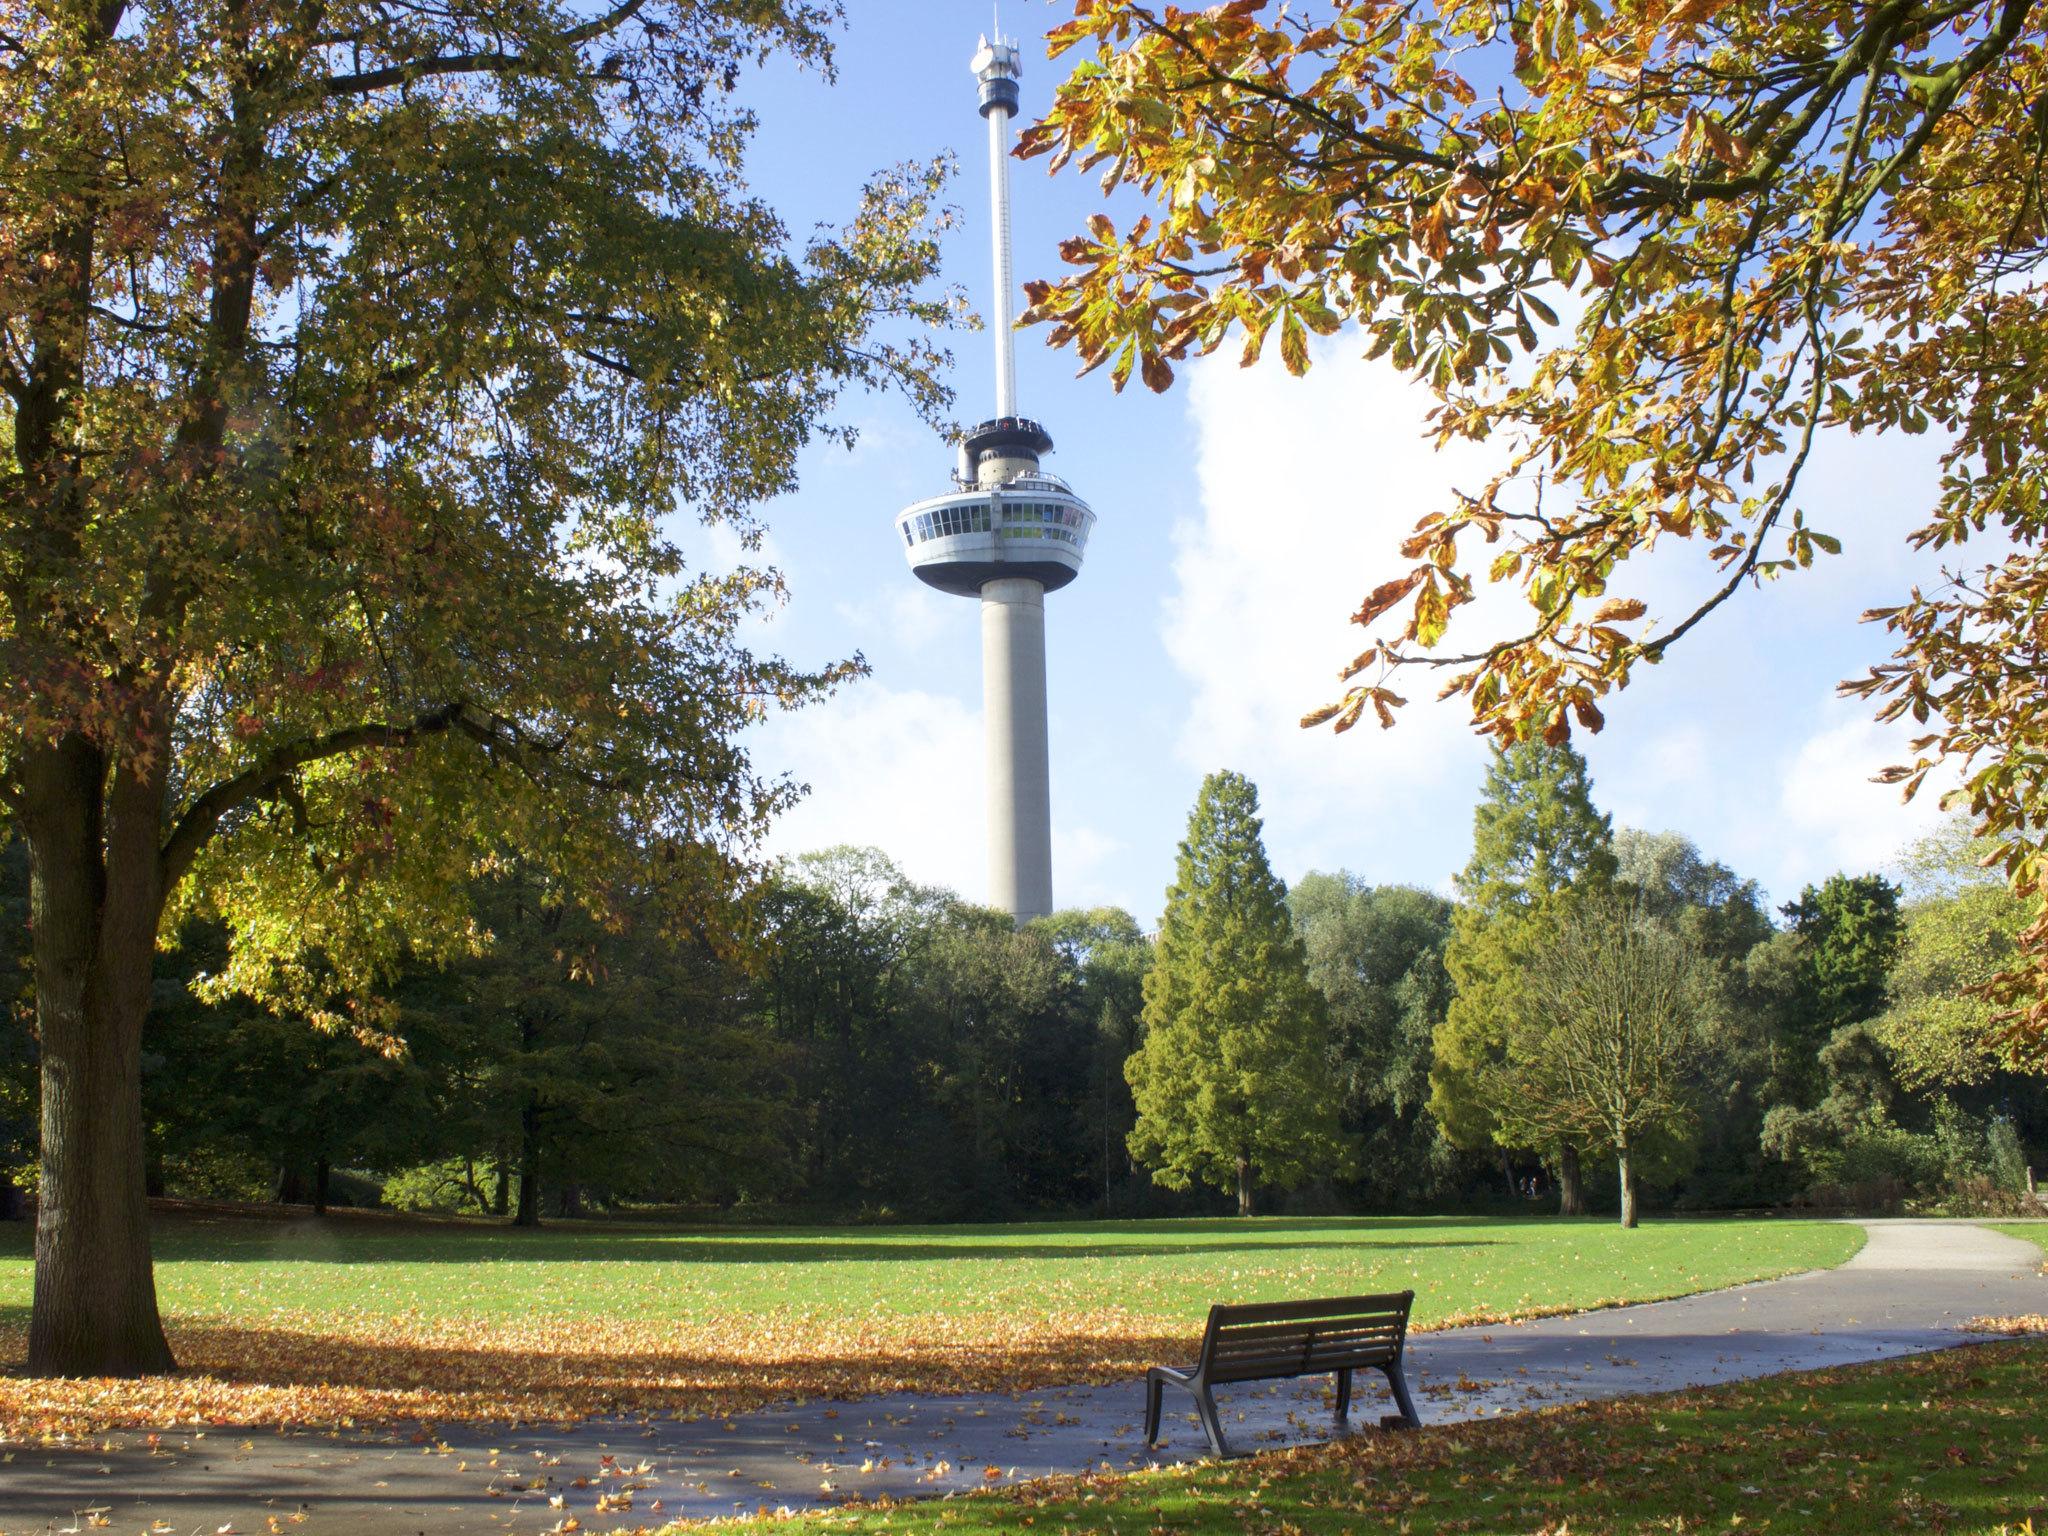 Euromast - Rotterdam - Netherlands